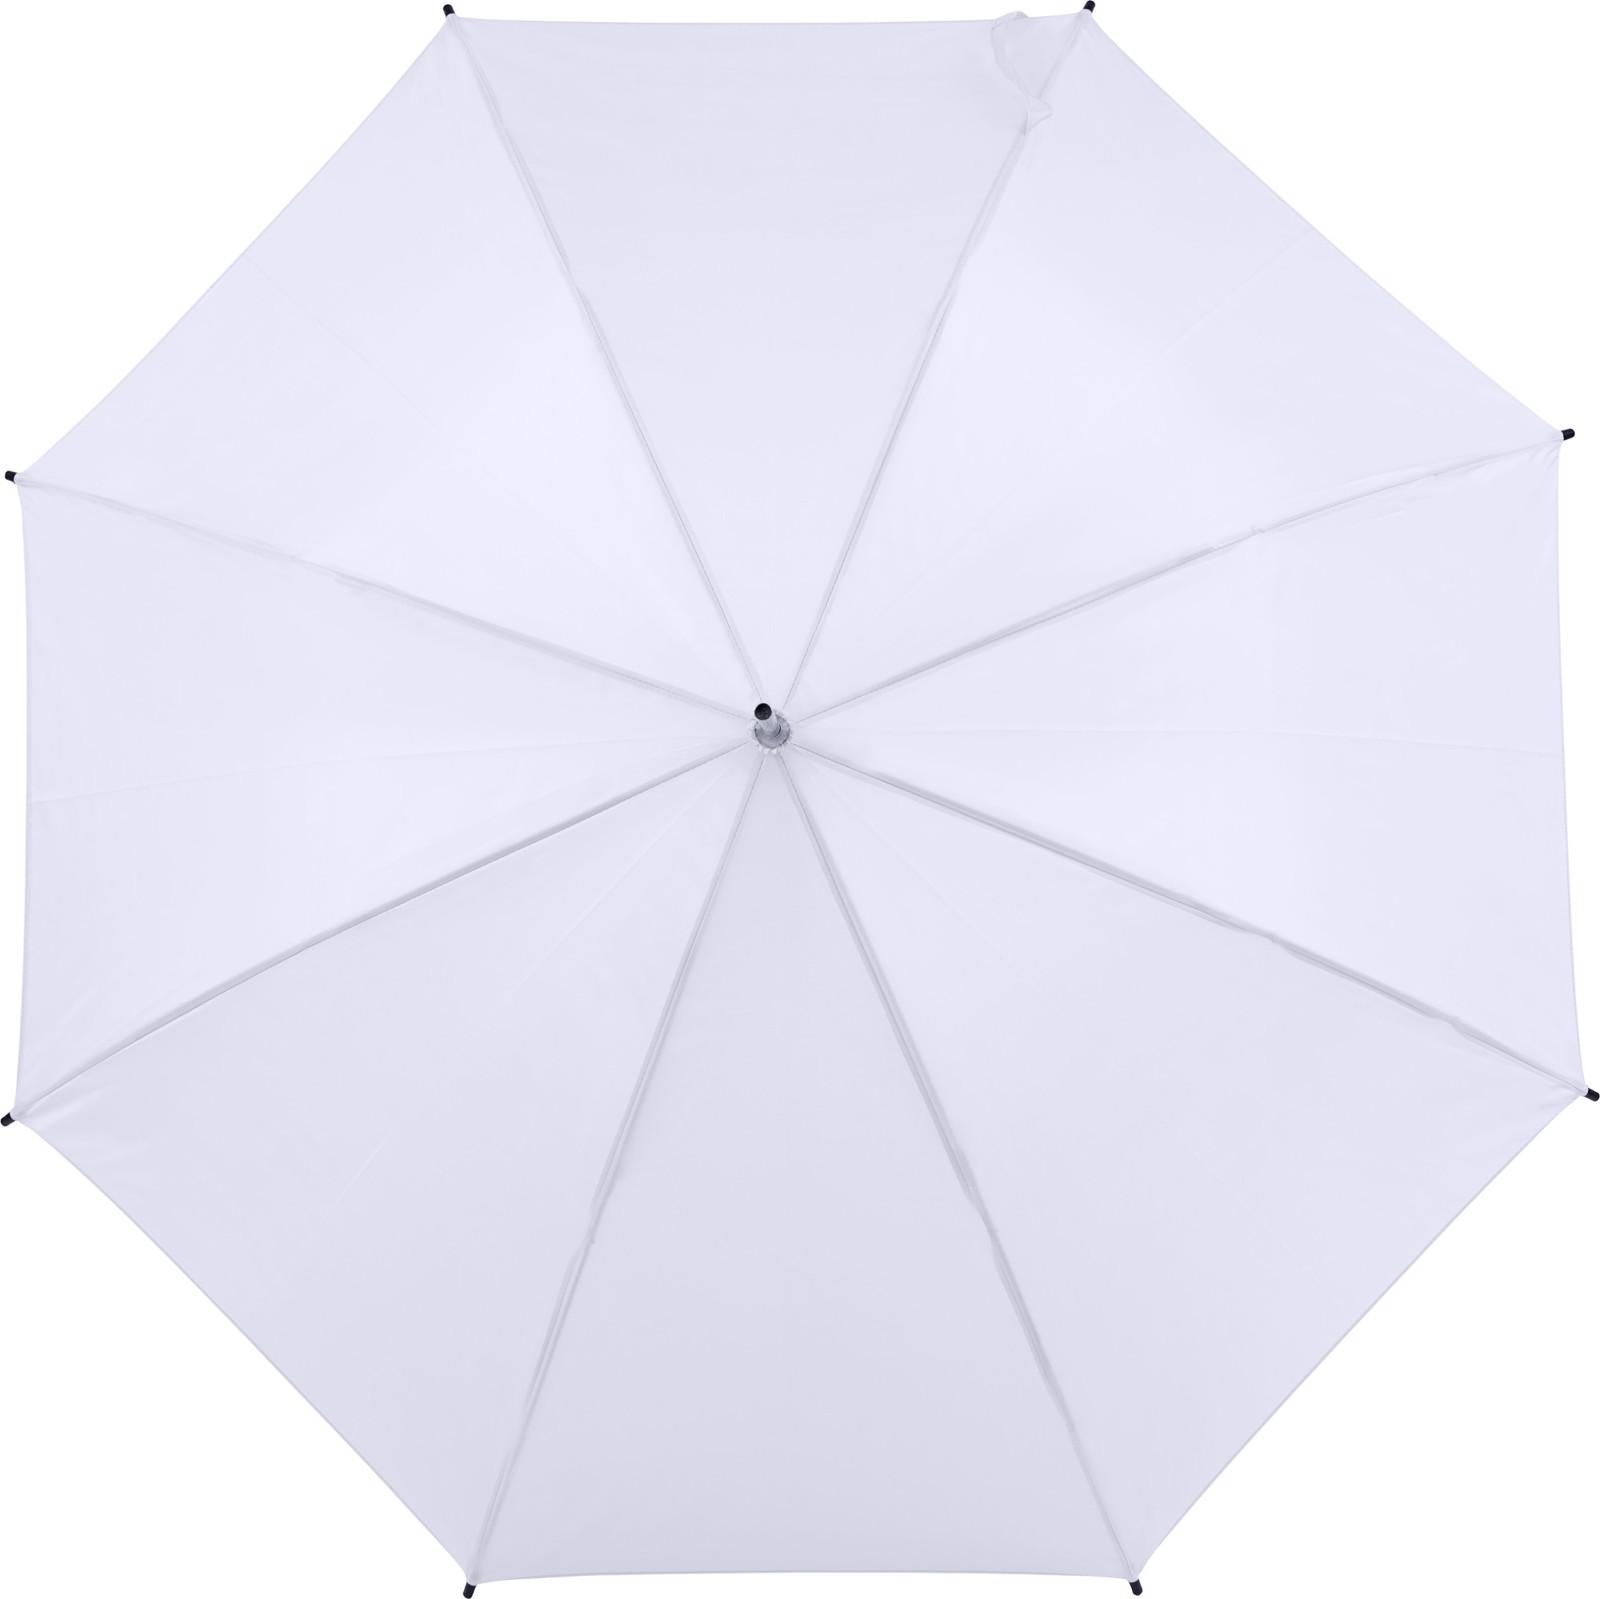 Polyester (190T) umbrella - White